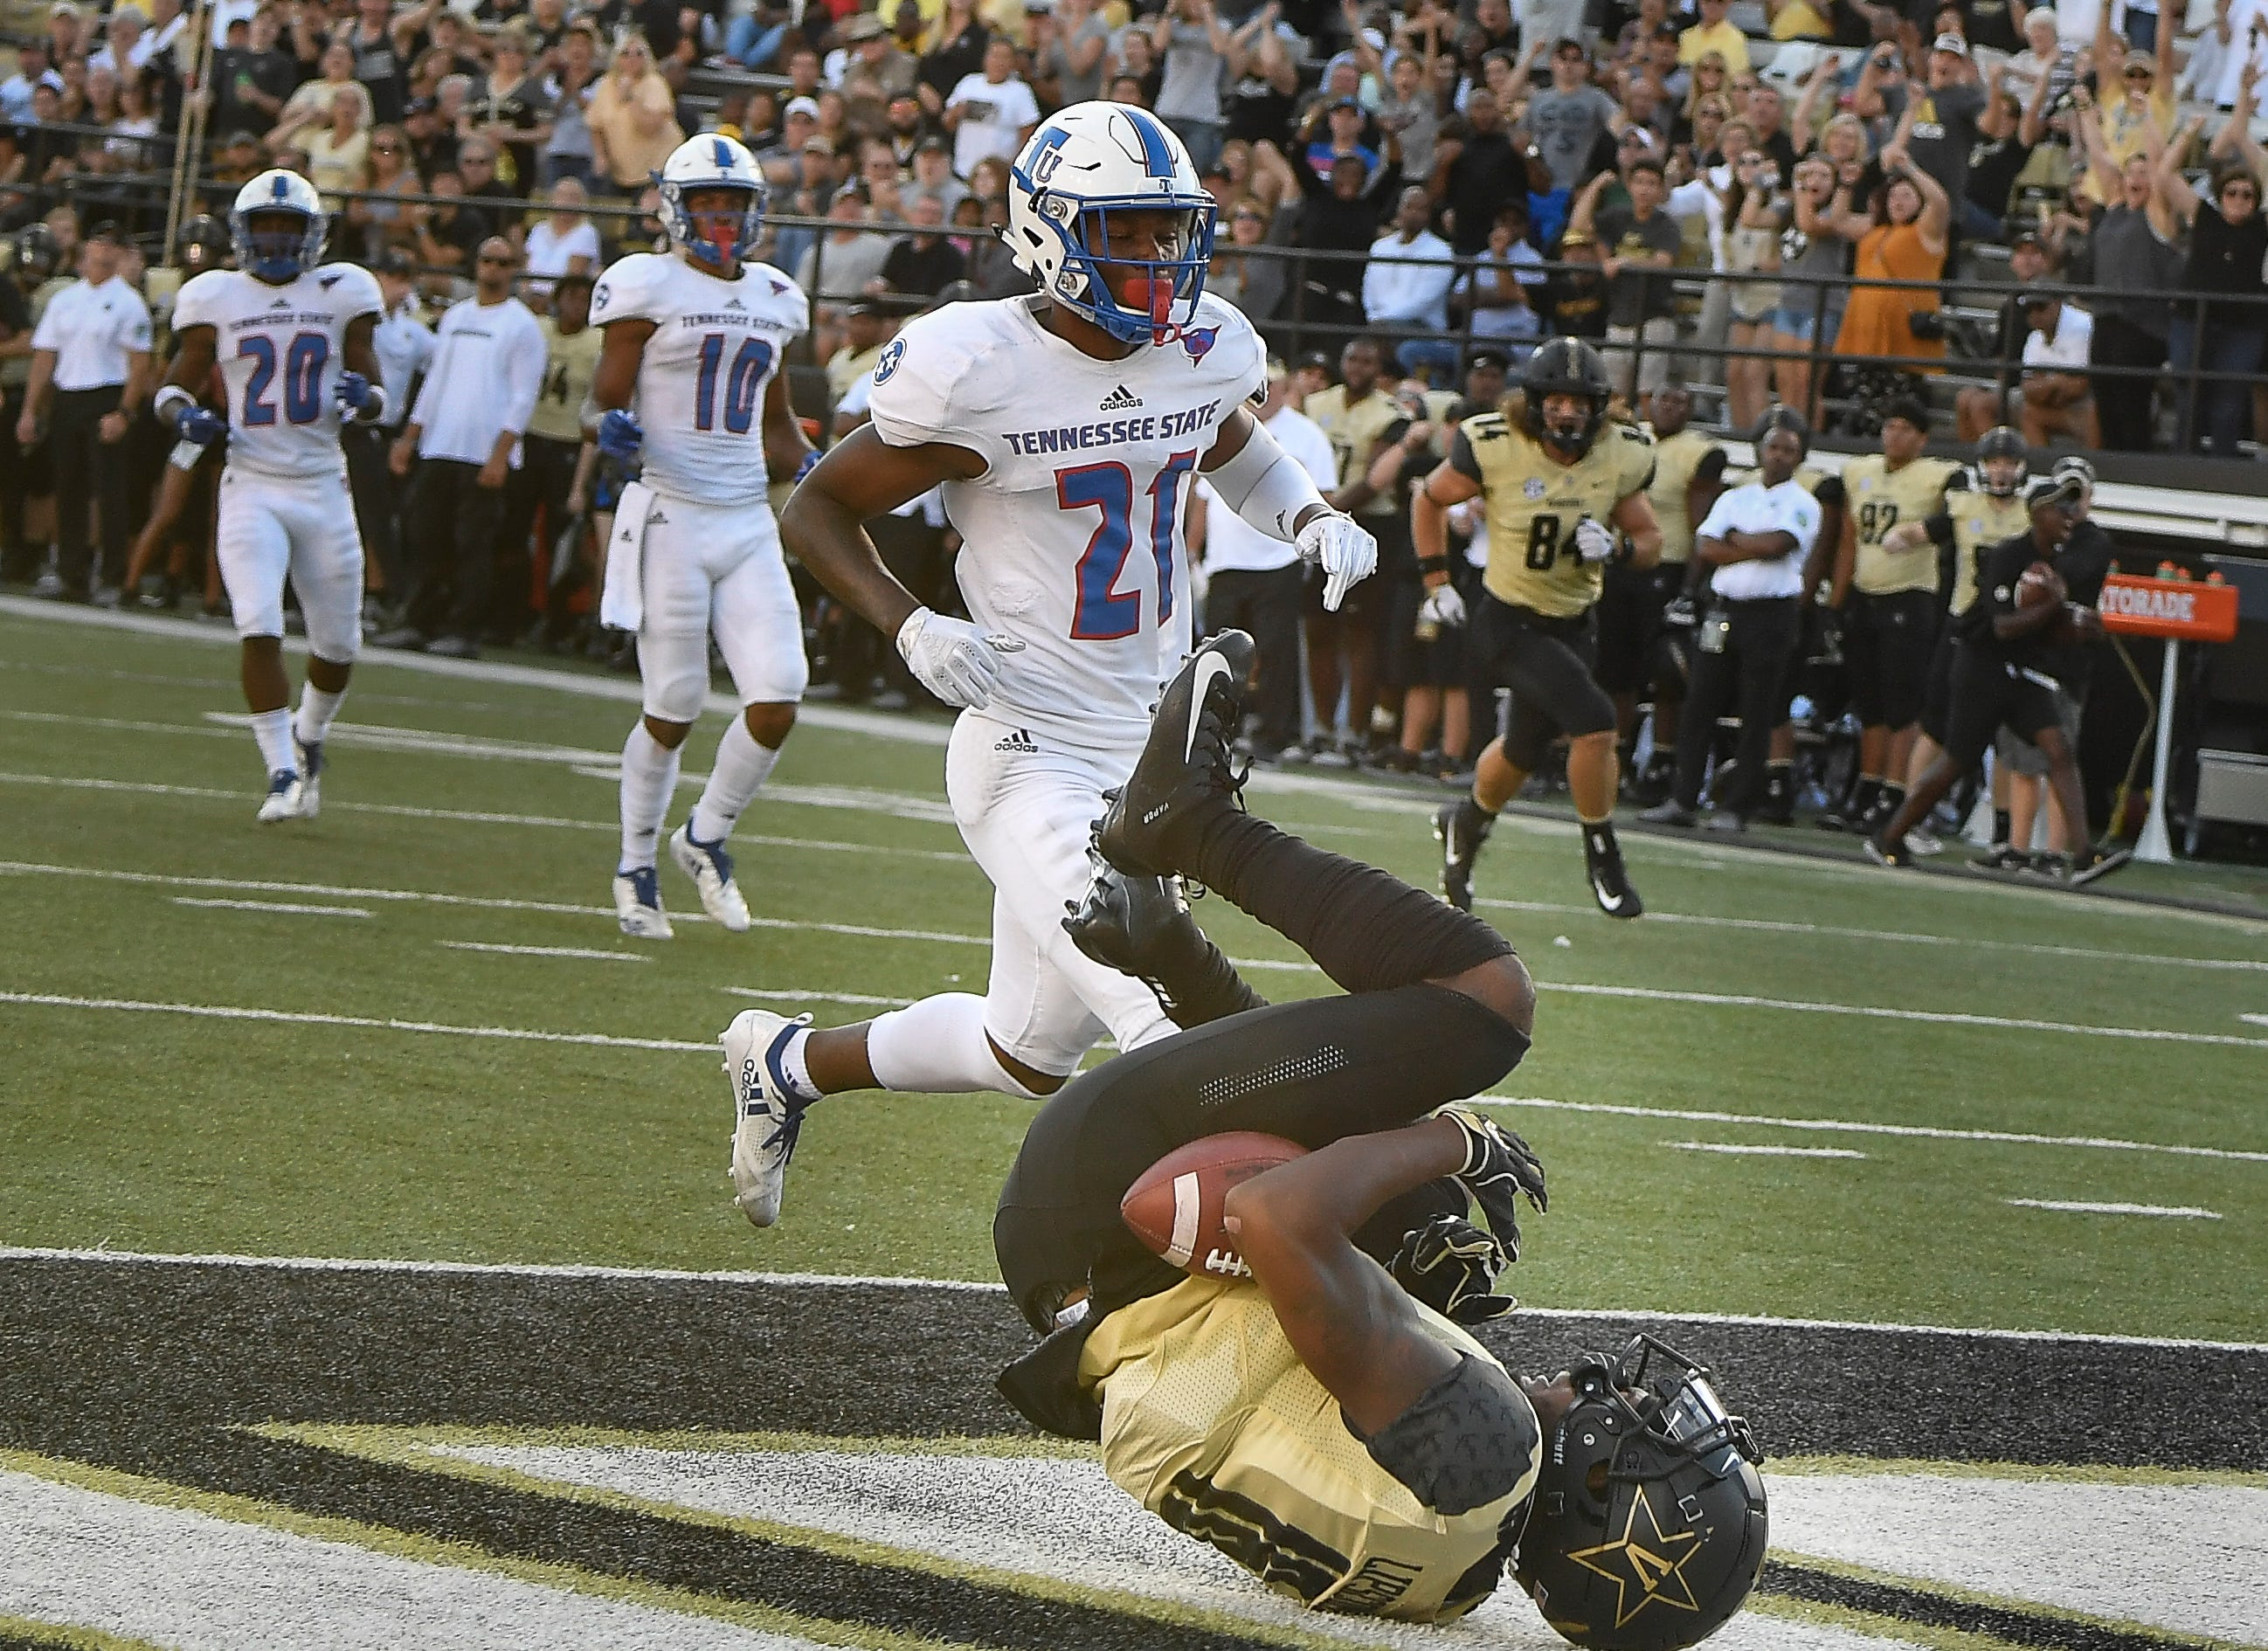 Vanderbilt wide receiver Kalija Lipscomb (16) falls into the end zone with a touchdown catch past TSU cornerback Neiman Armstrong (21) during the third quarter at Vanderbilt Stadium Saturday, Sept. 29, 2018, in Nashville, Tenn.